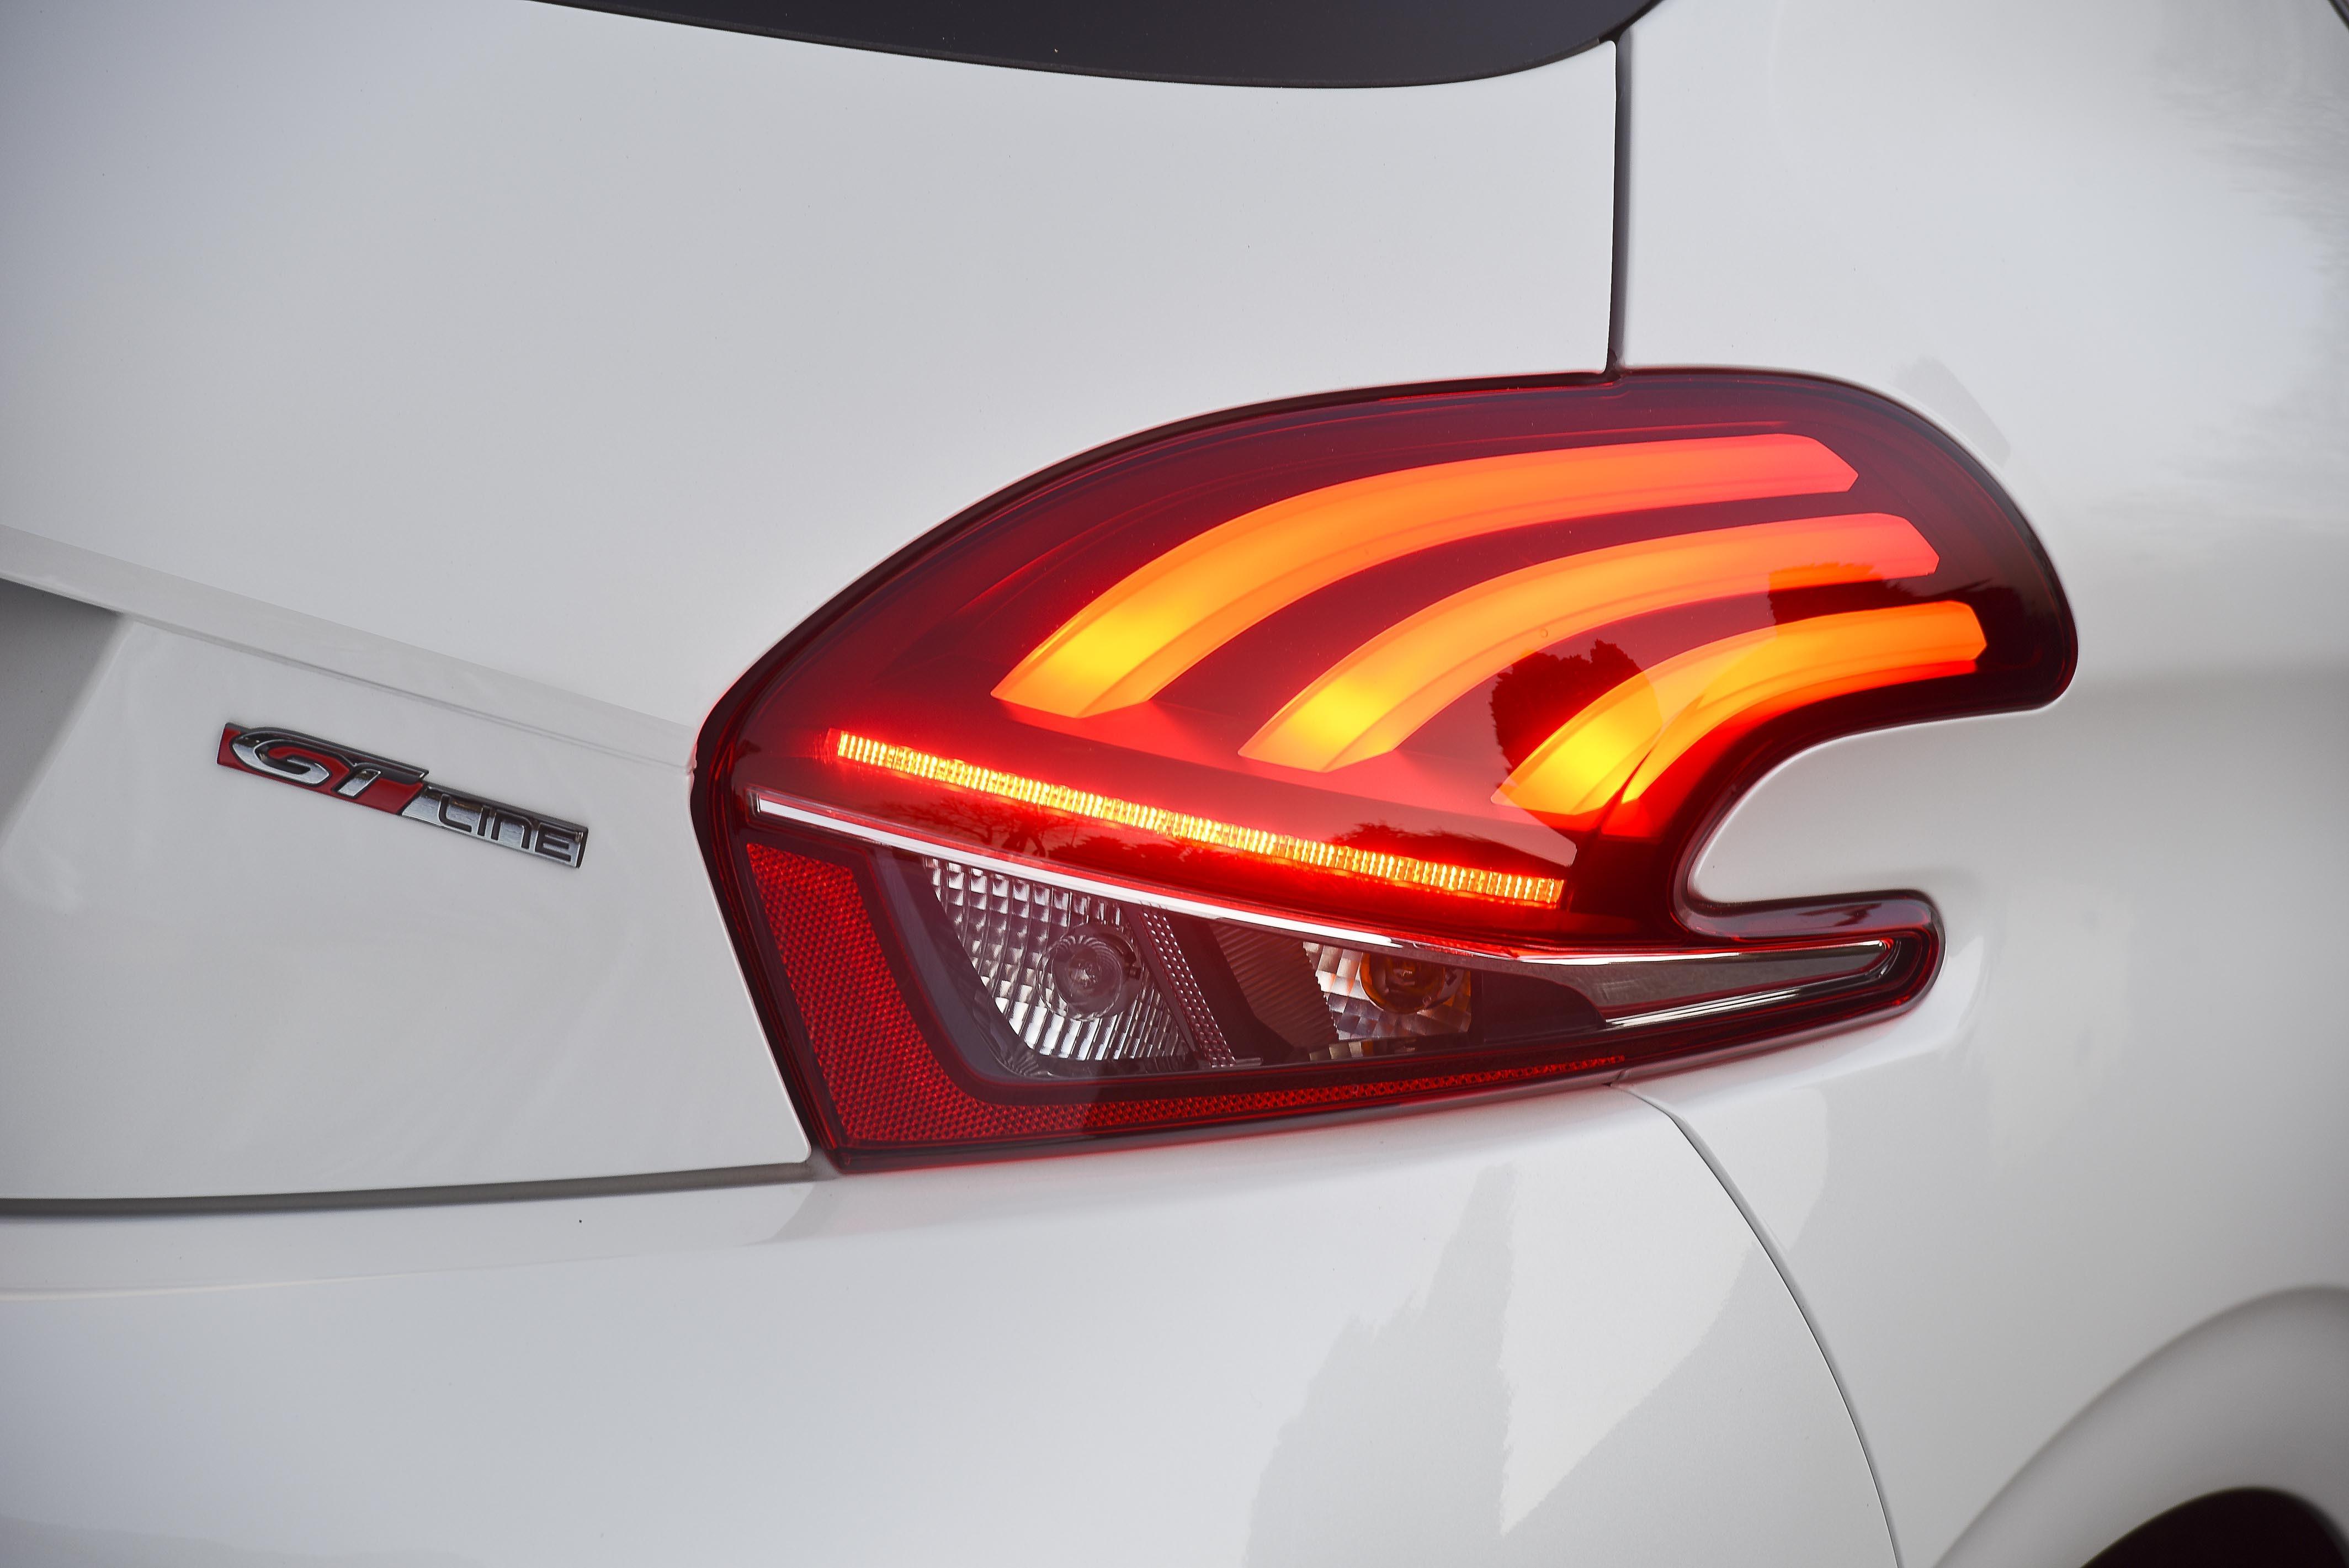 Peugeot 208 GT Line AT: Sometimes, good enough just isn